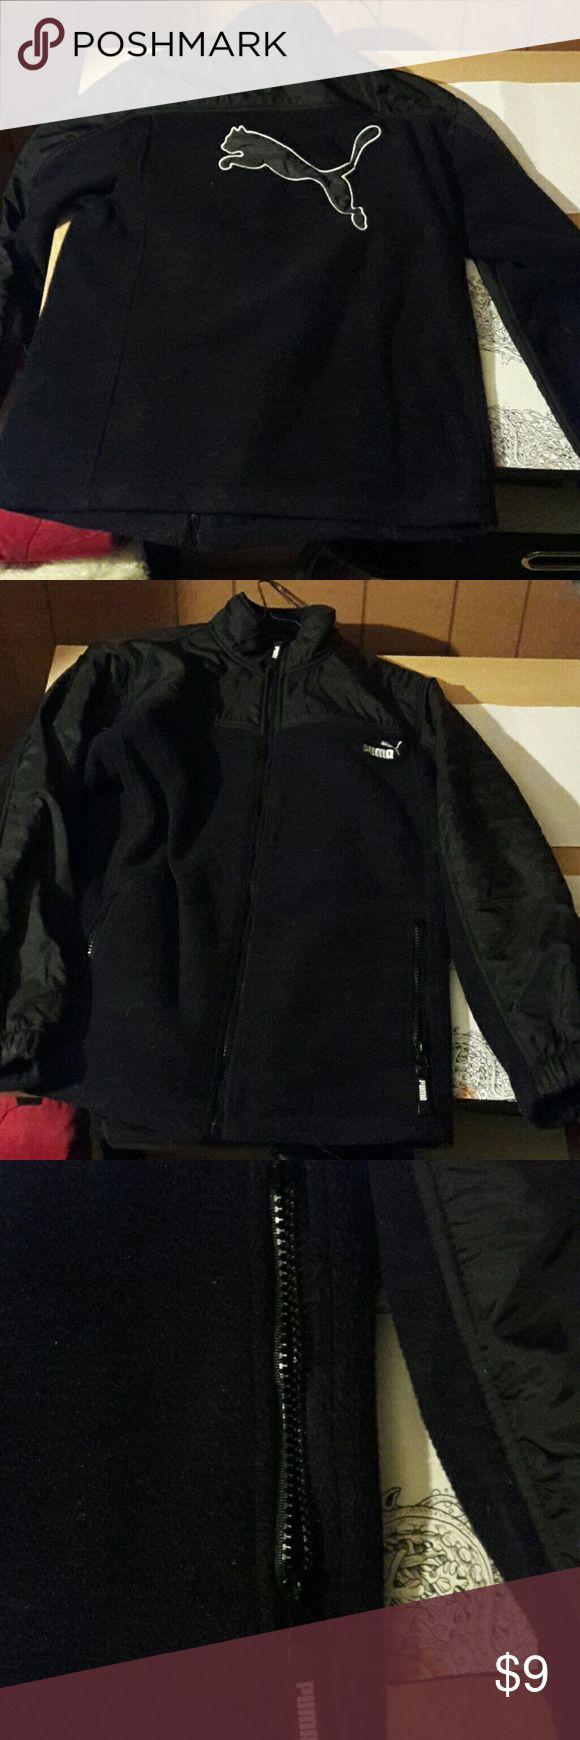 Fleece boys jacket Boys black puma sweatshirt jacket. Fleece. Really nice, excellent condition.  2 side zip pockets. Very soft. Puma Tops Sweatshirts & Hoodies